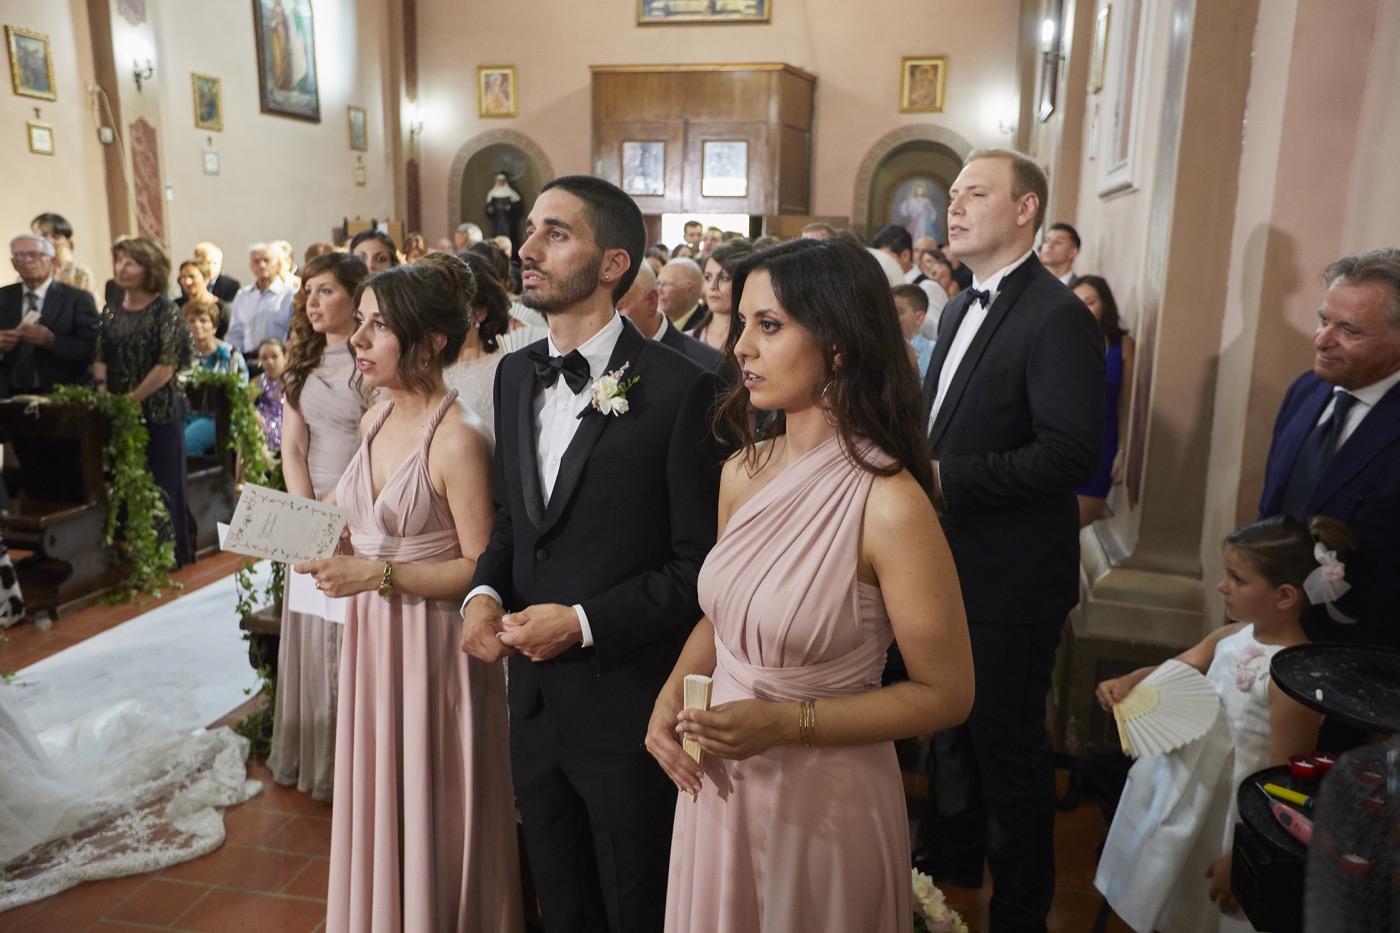 Claudio-Coppola-wedding-photographer-abbazia-7-frati-piegaro-44